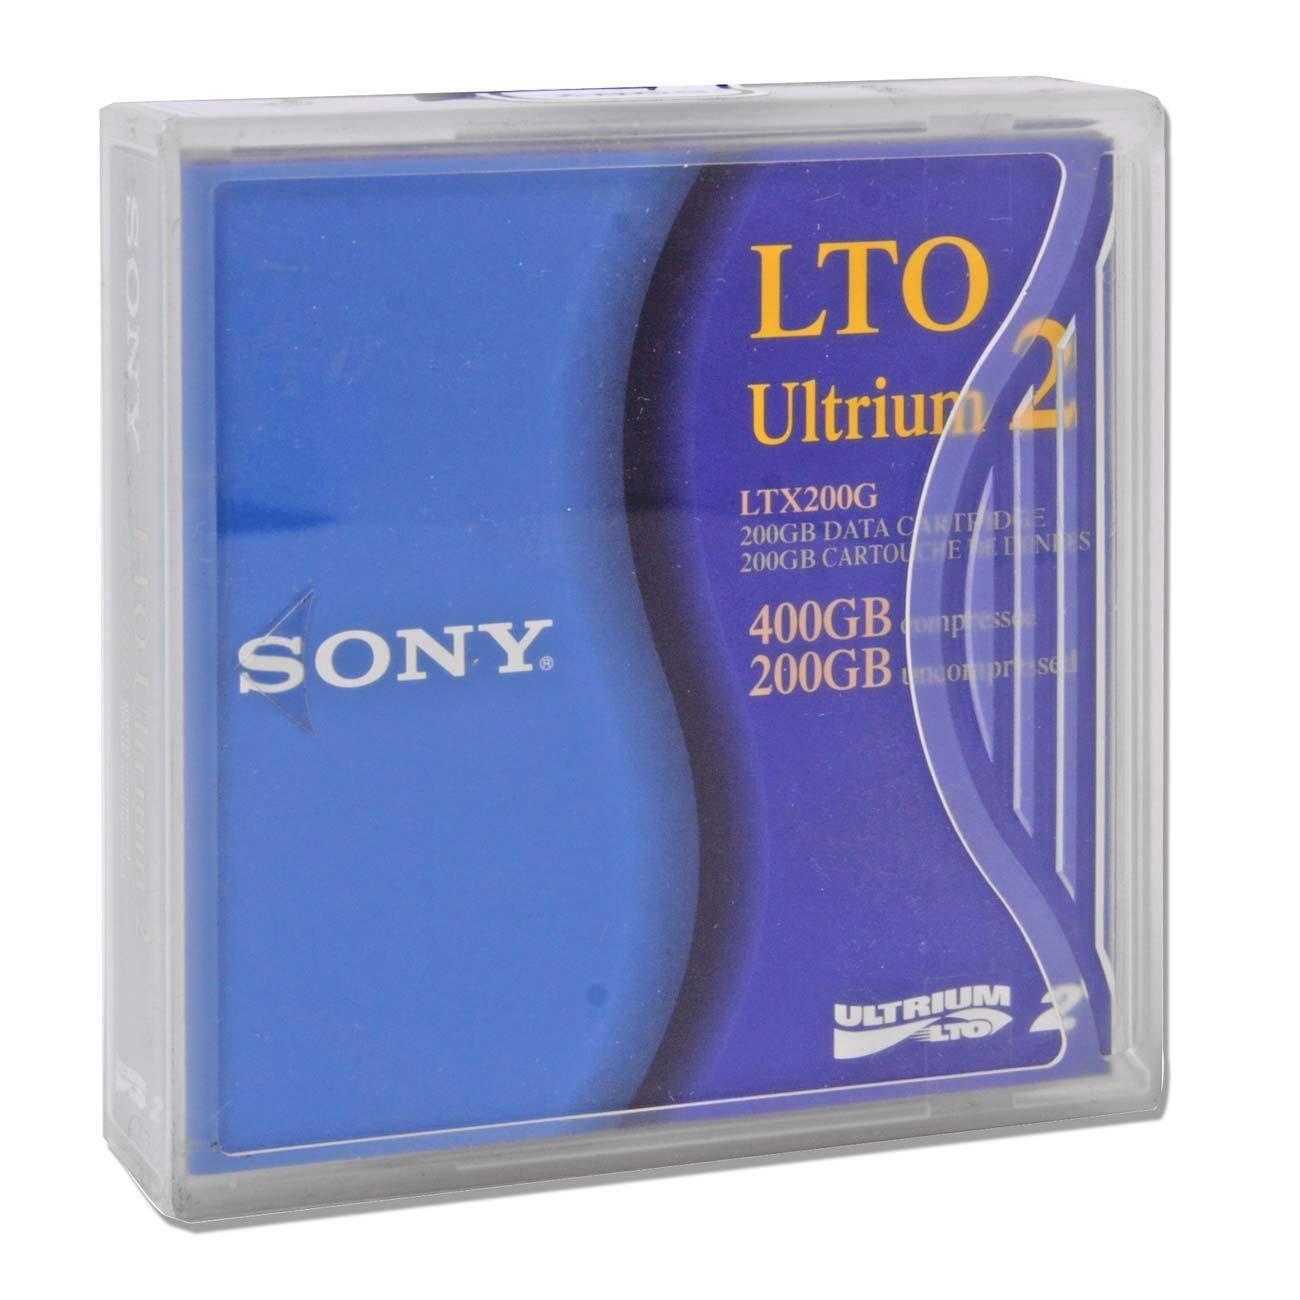 Sony LTX200G Data Cartridge LTO-2